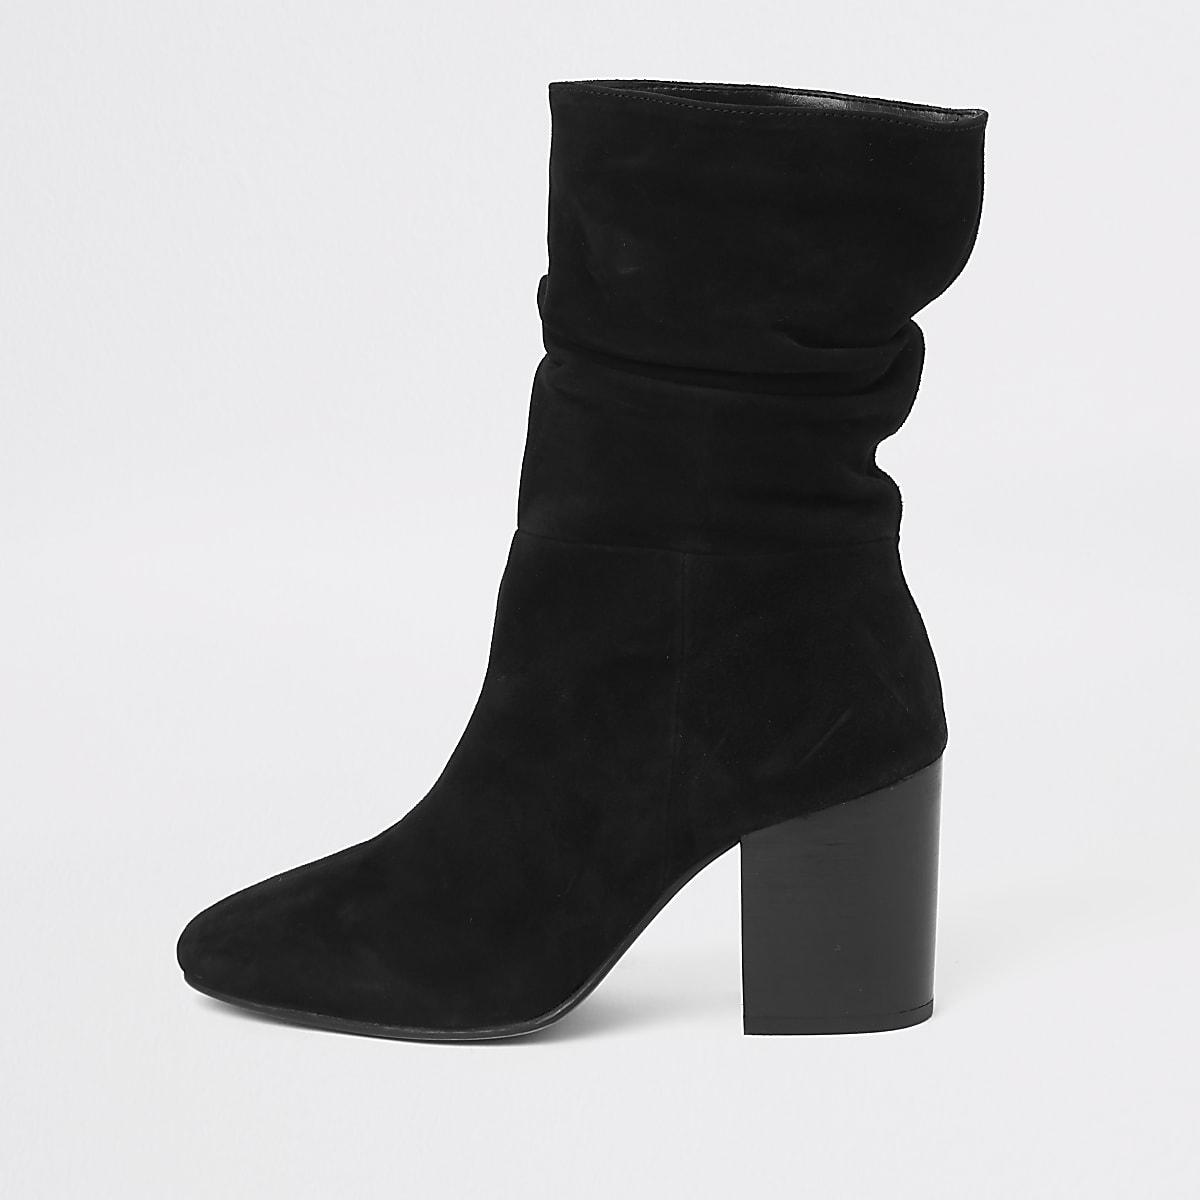 e4d45961458 Black suede slouch block heel boots - Boots - Shoes   Boots - women